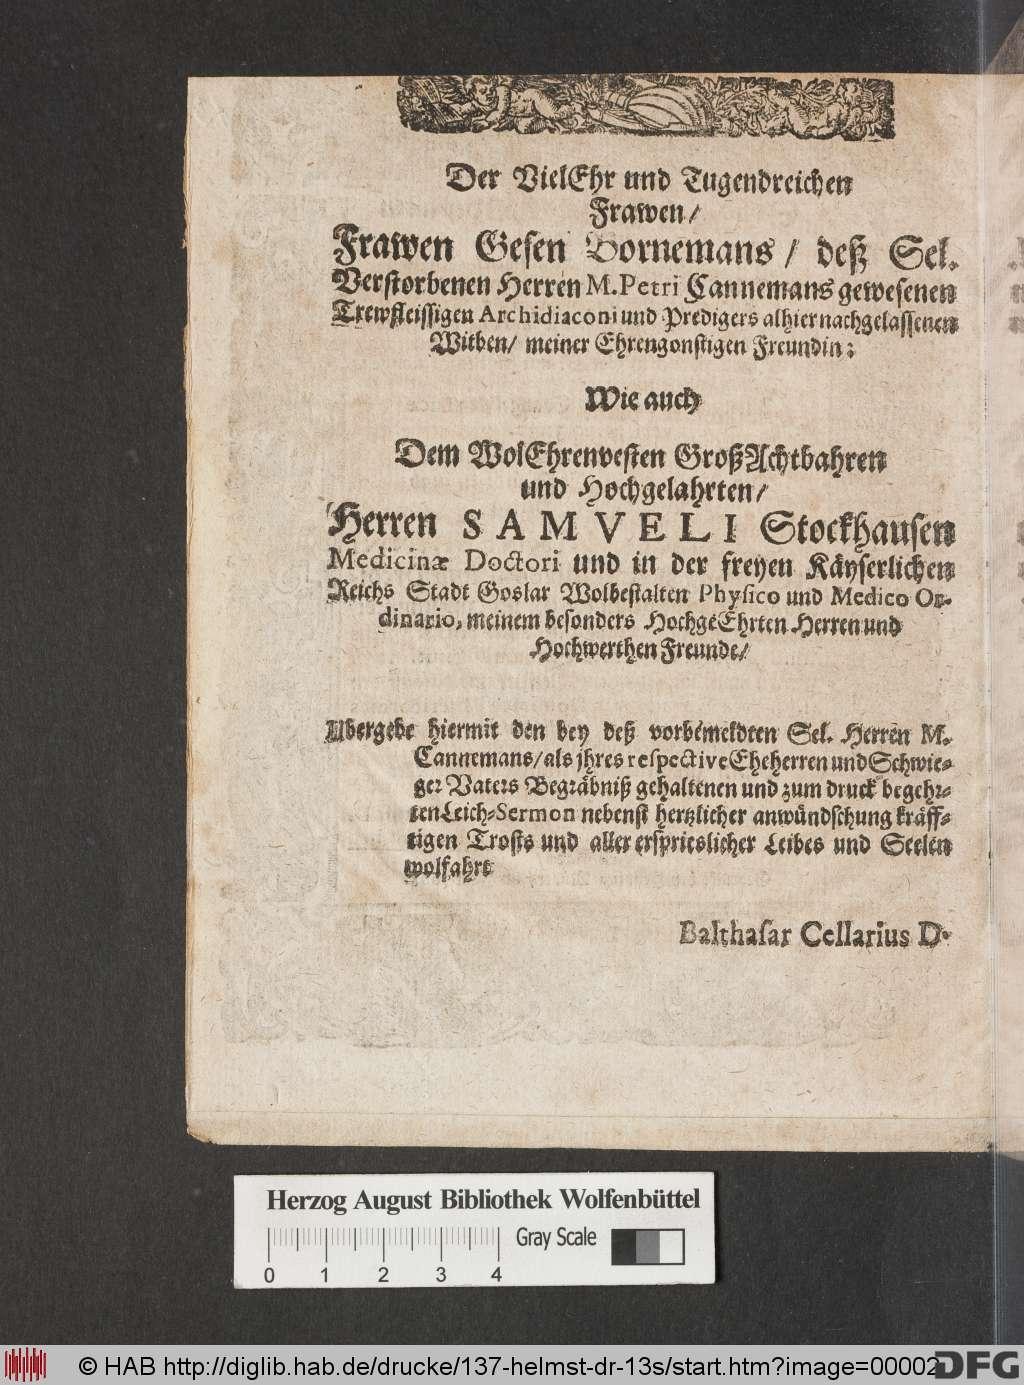 http://diglib.hab.de/drucke/137-helmst-dr-13s/00002.jpg